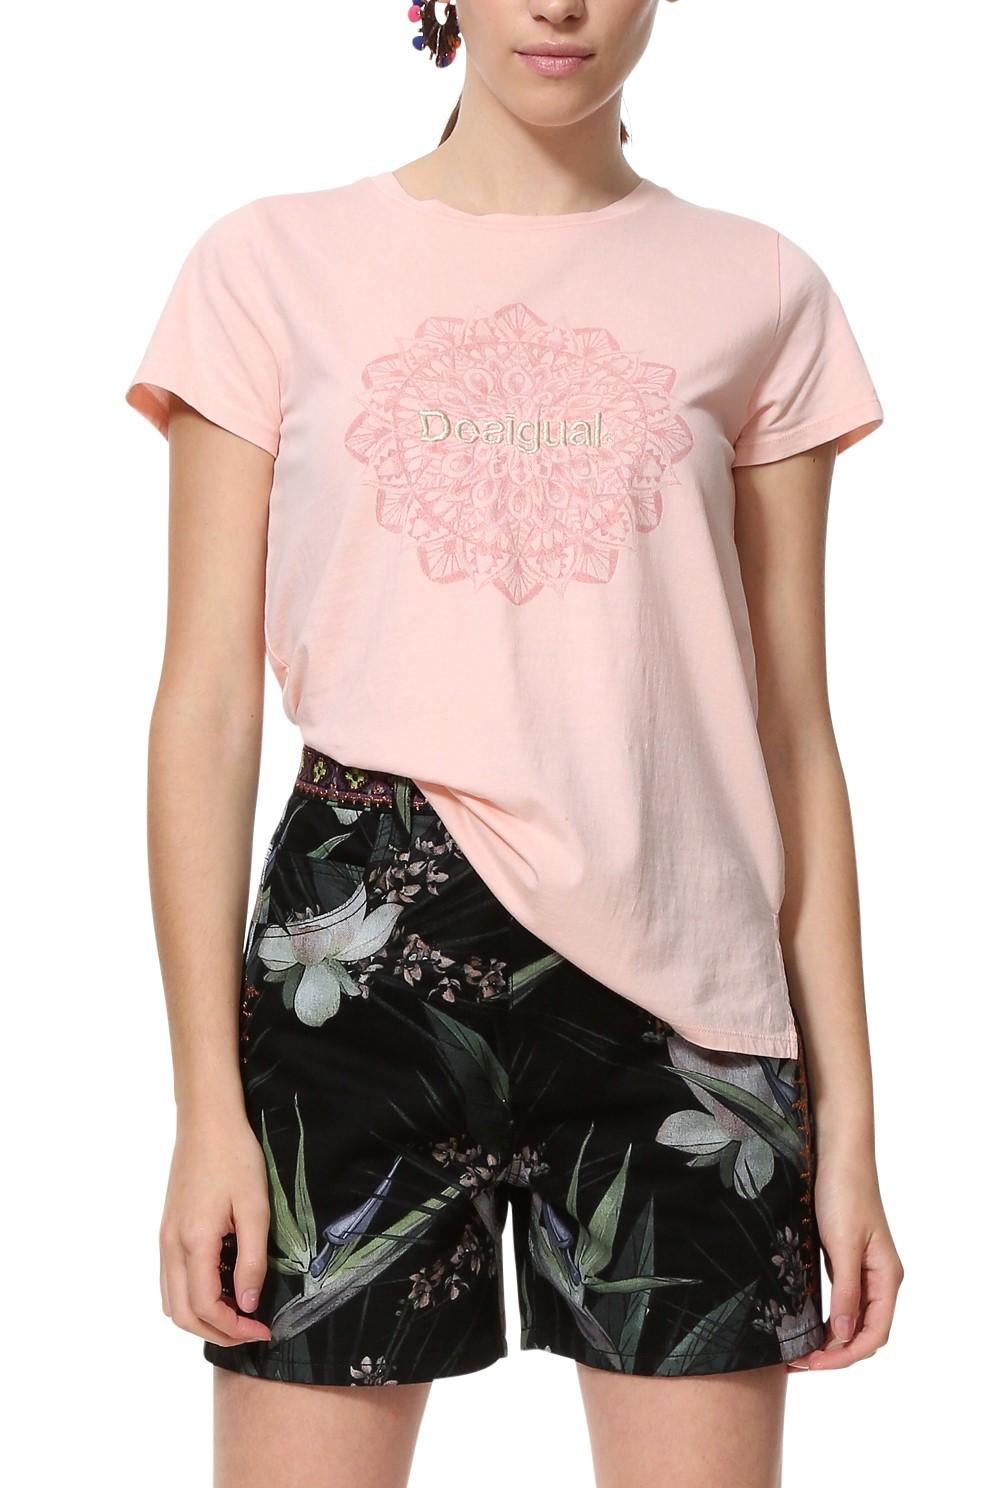 Desigual ružové športové tričko TS Manchester - Glami.sk b074d1c7116